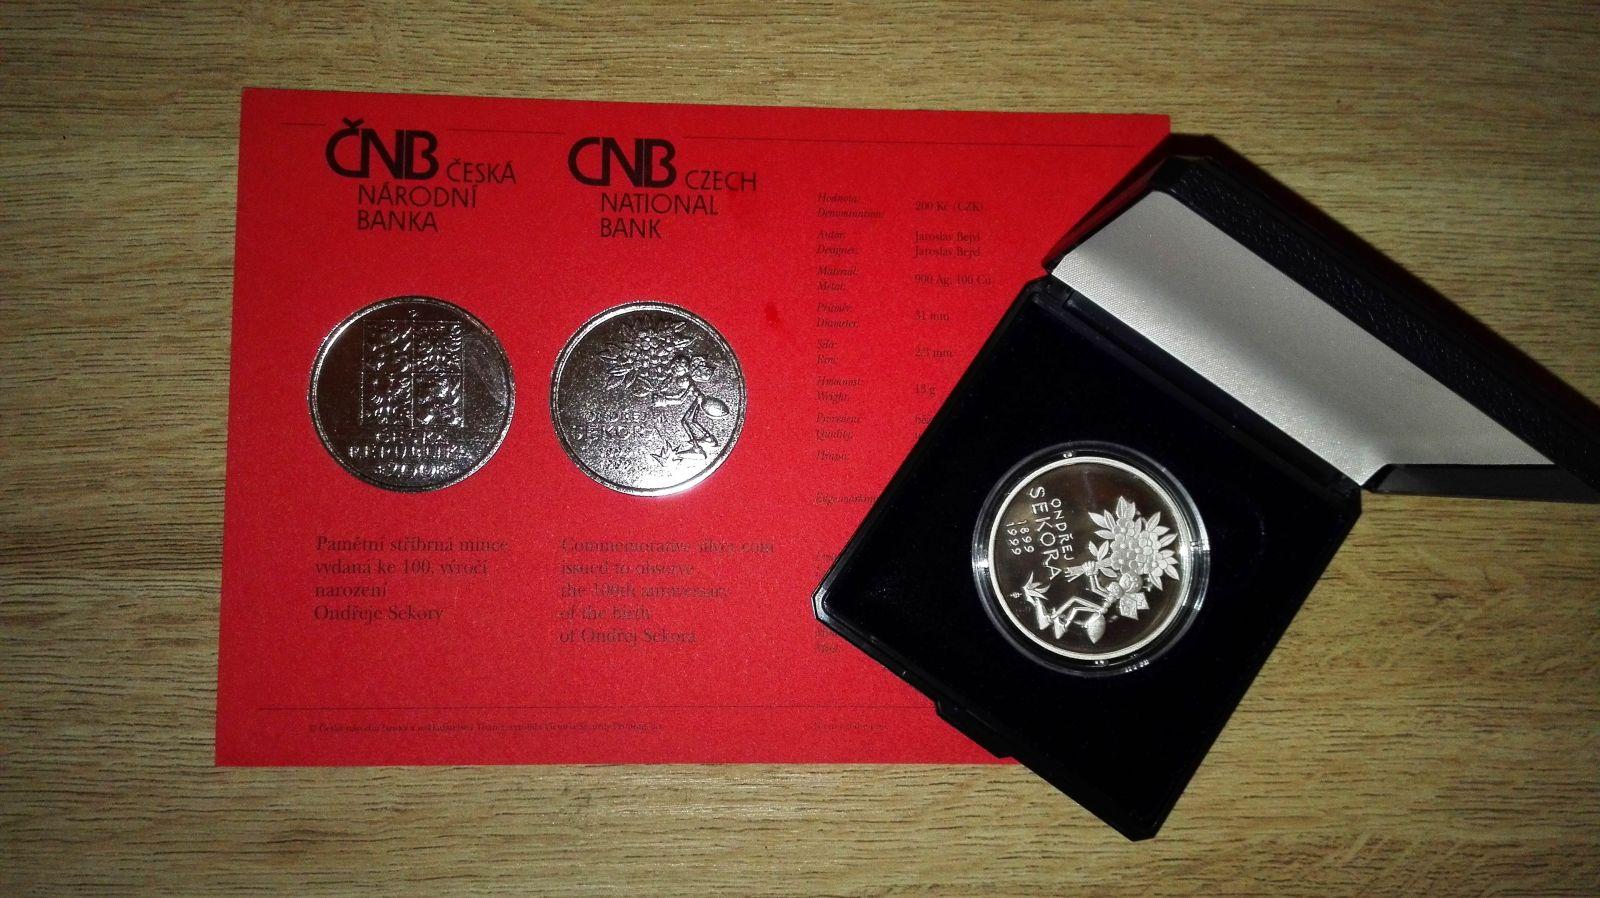 200 Kč(1999-Sekora), stav PROOF, etue, certifikát